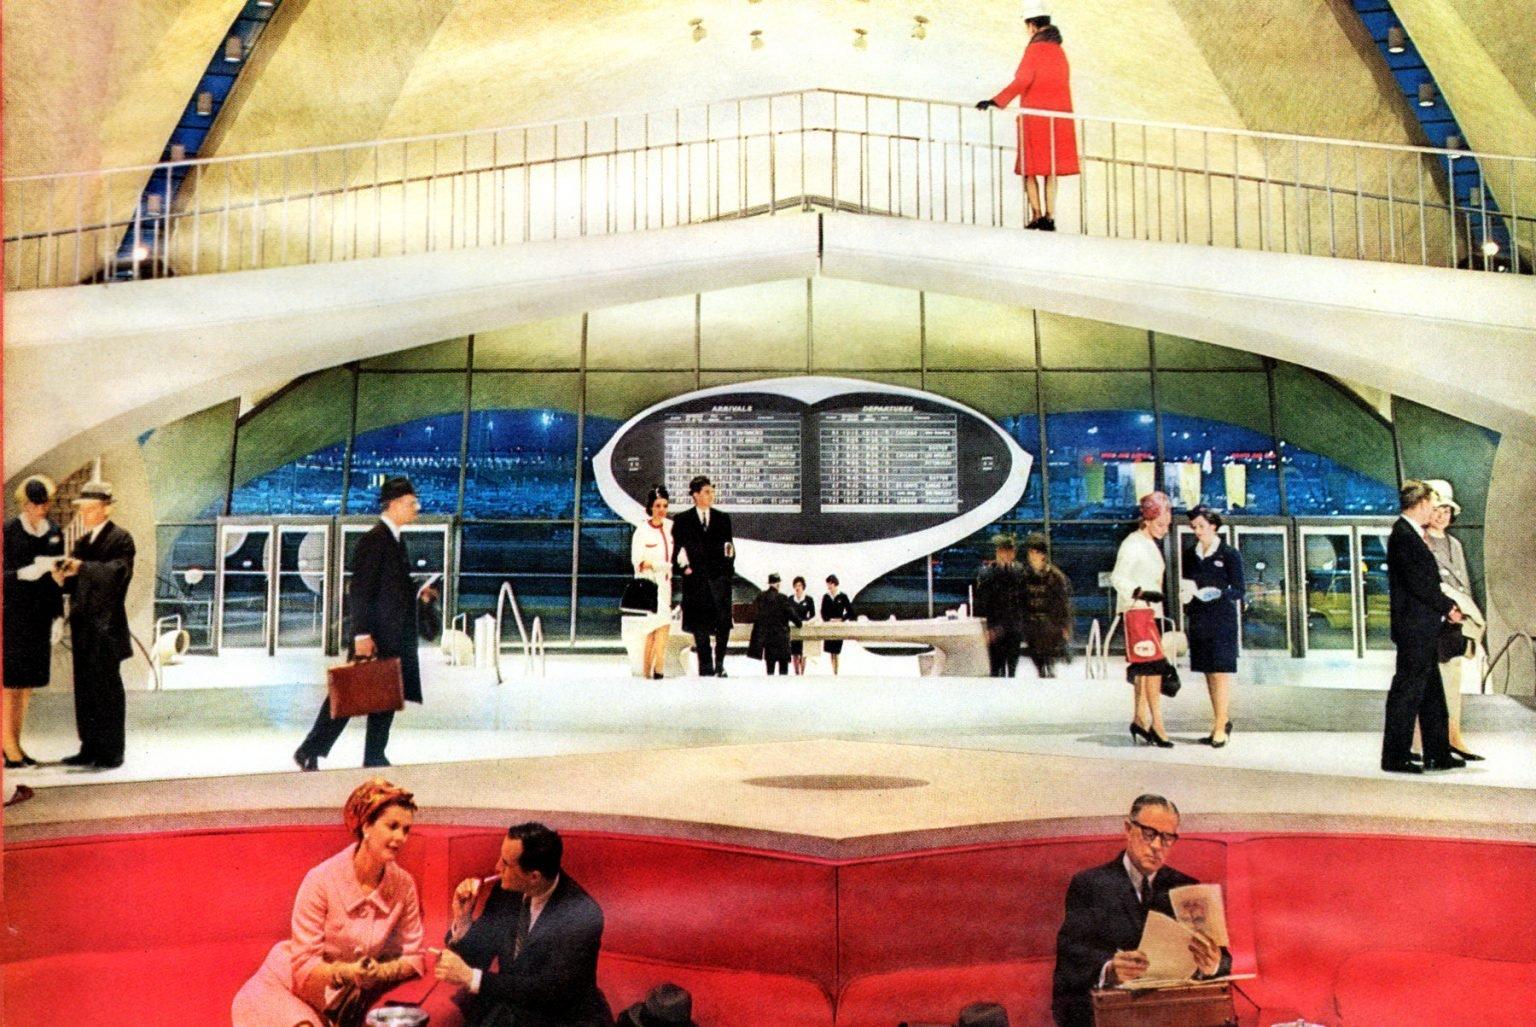 Trans World Flight Center in New York - TWA JFK NYC